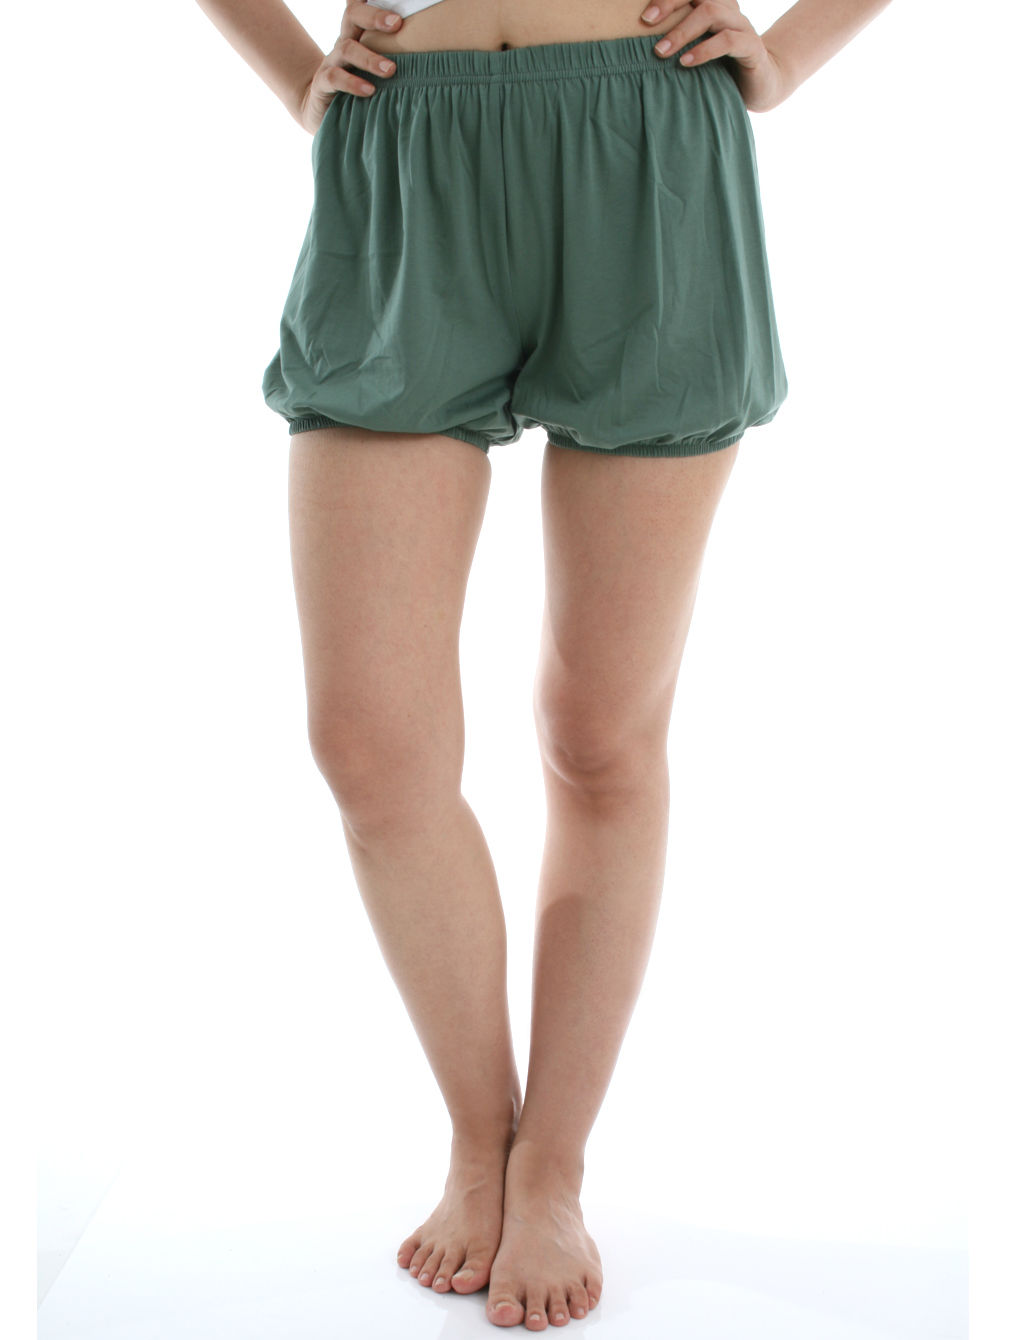 RTBU瑜珈褲~燈籠褲造型。藻綠